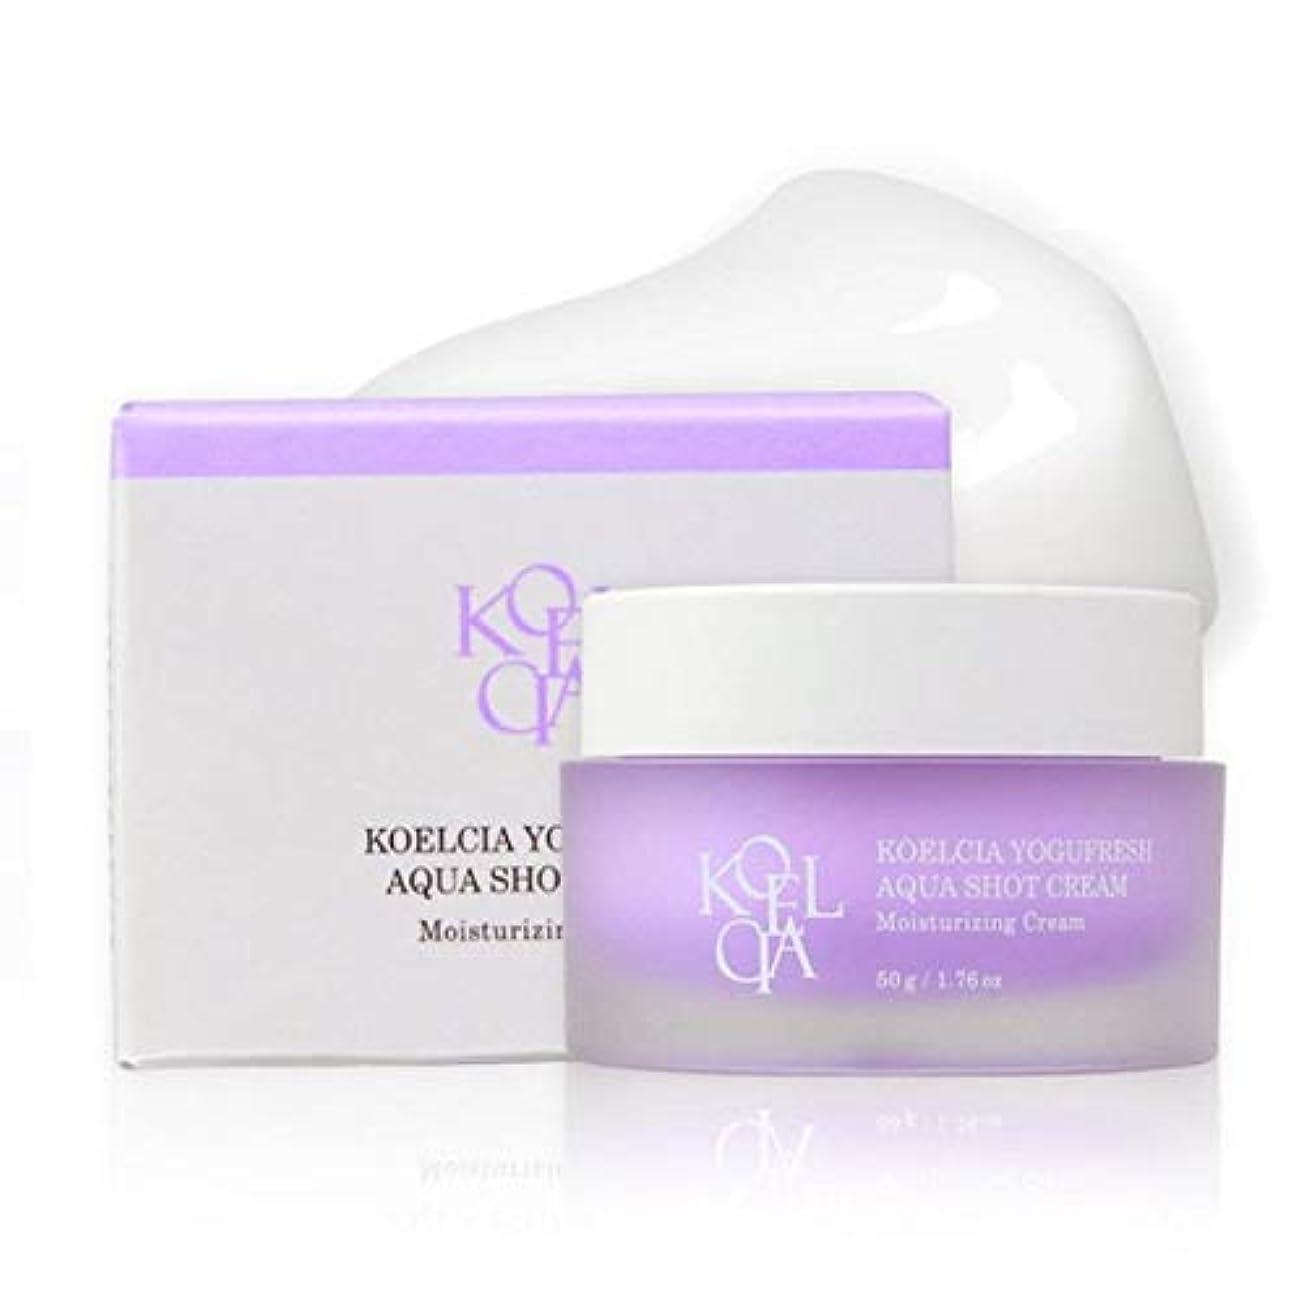 航空機区別伝記KOELCIA YOGUFRESH AQUA SHOT CREAM 50g/Hot K-Beauty Best Moisture Cream/Korea Cosmetics [並行輸入品]